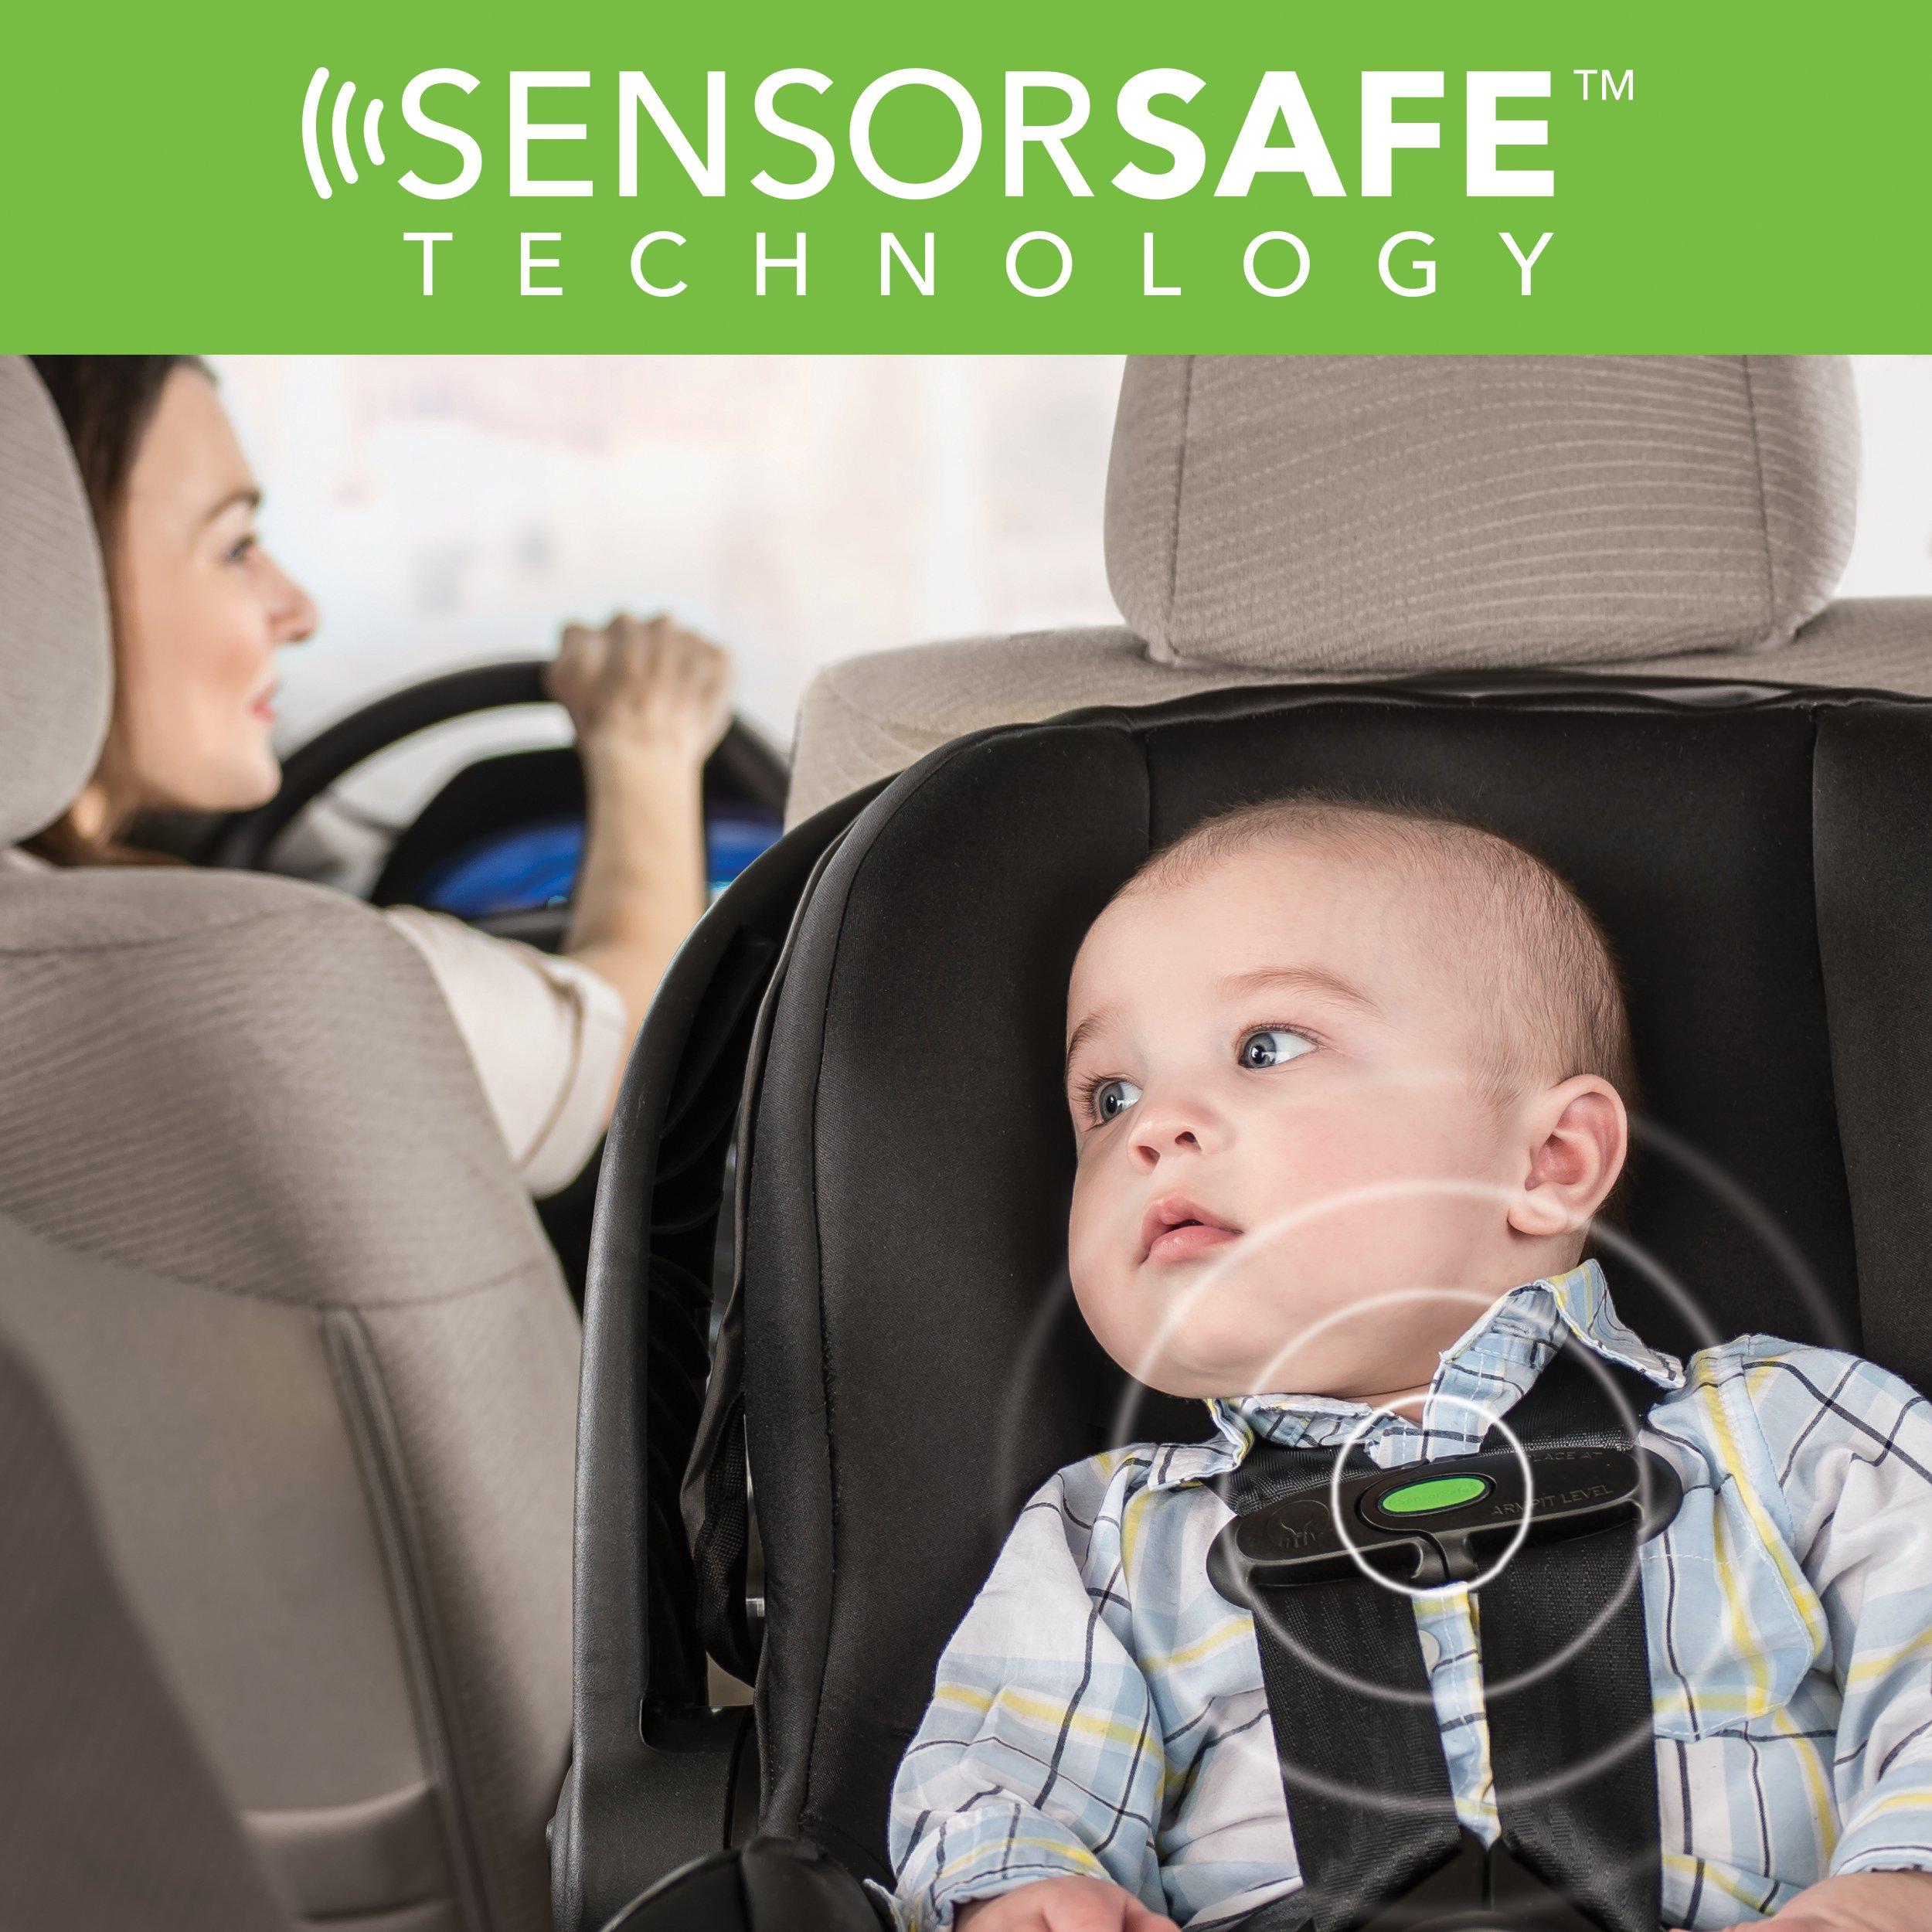 Evenflo Advanced SensorSafe Epic Travel System with LiteMax Infant Car Seat, Jet by Evenflo (Image #3)